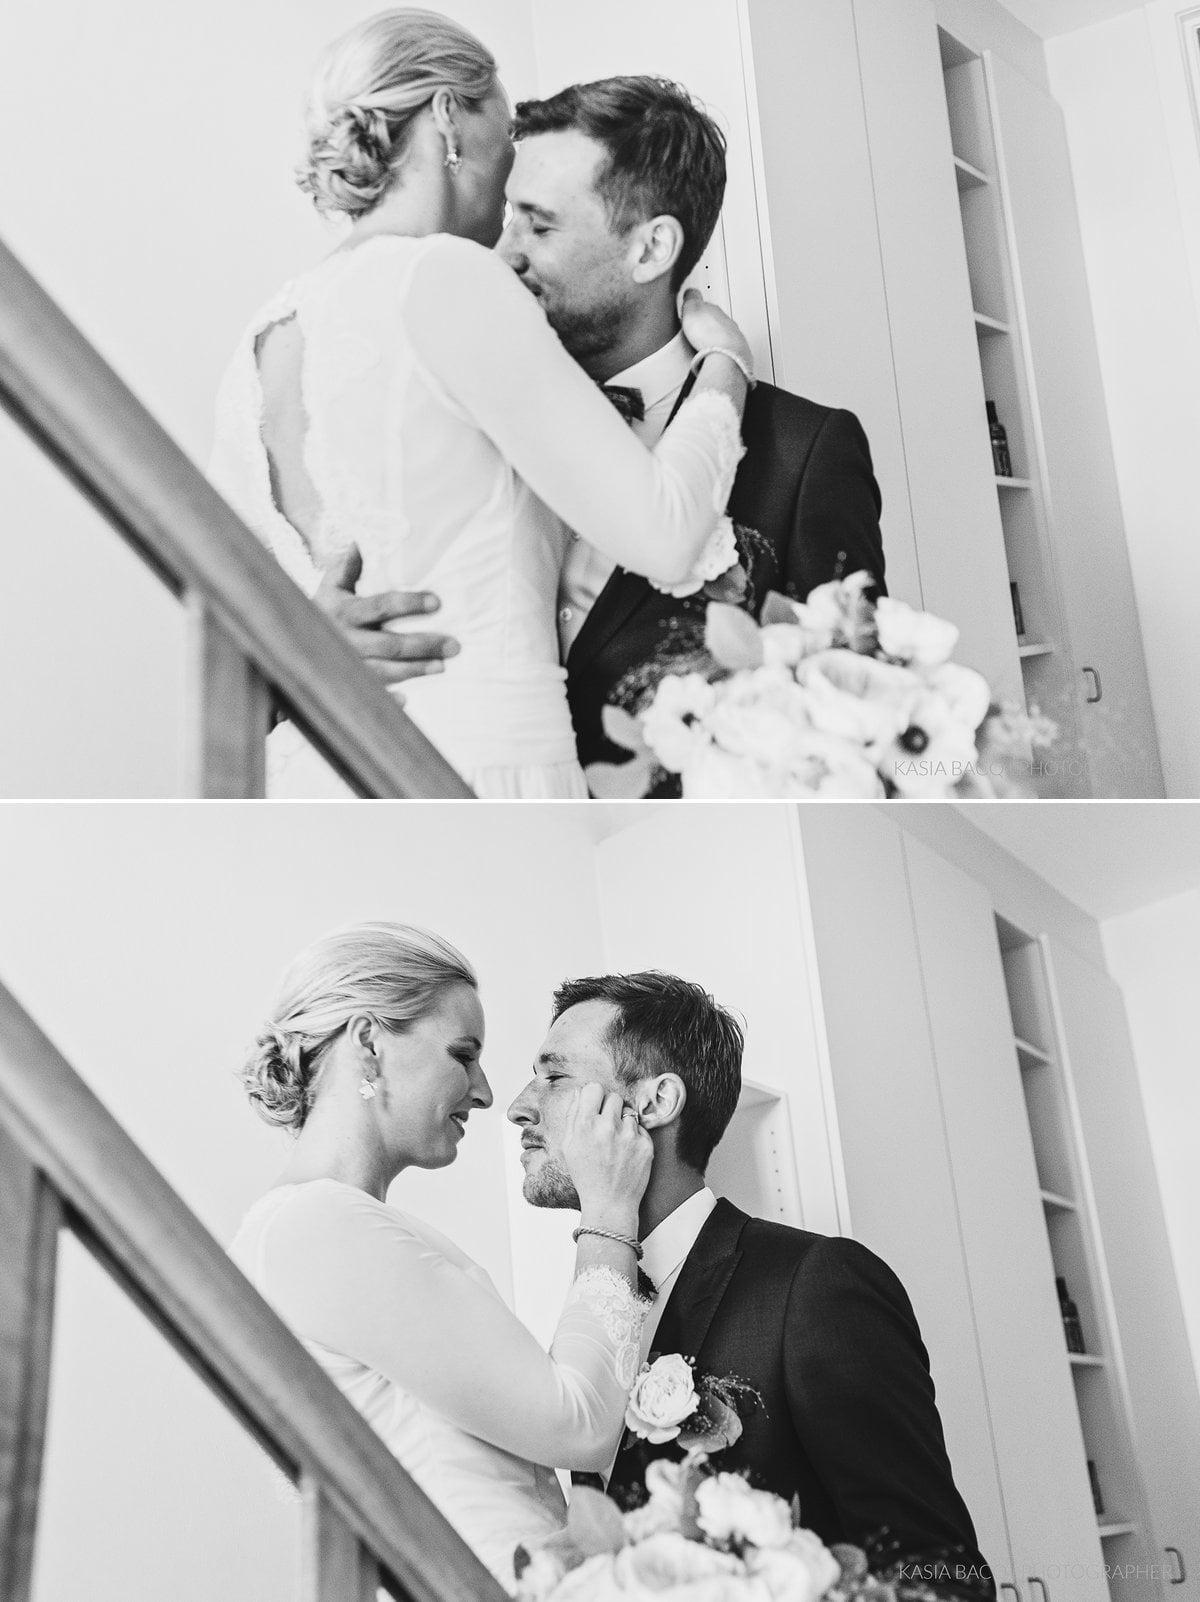 Scandinavian Wedding in Brugge Stan & Britt Kasia Bacq-14